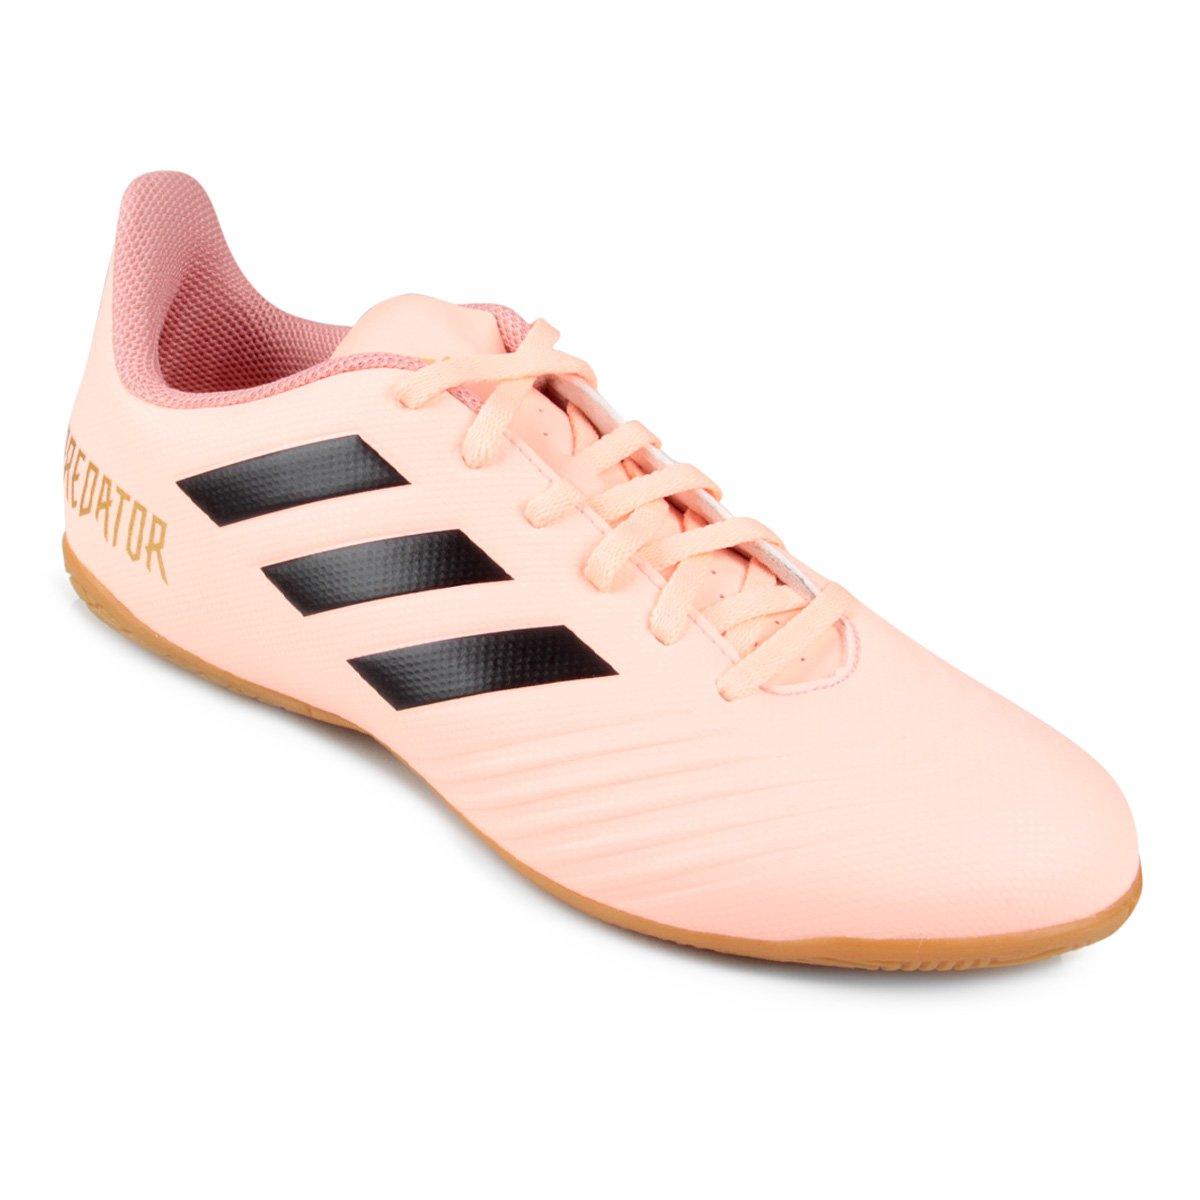 Figura Pasado Mojado  adidas rosa predator Shop Clothing & Shoes Online